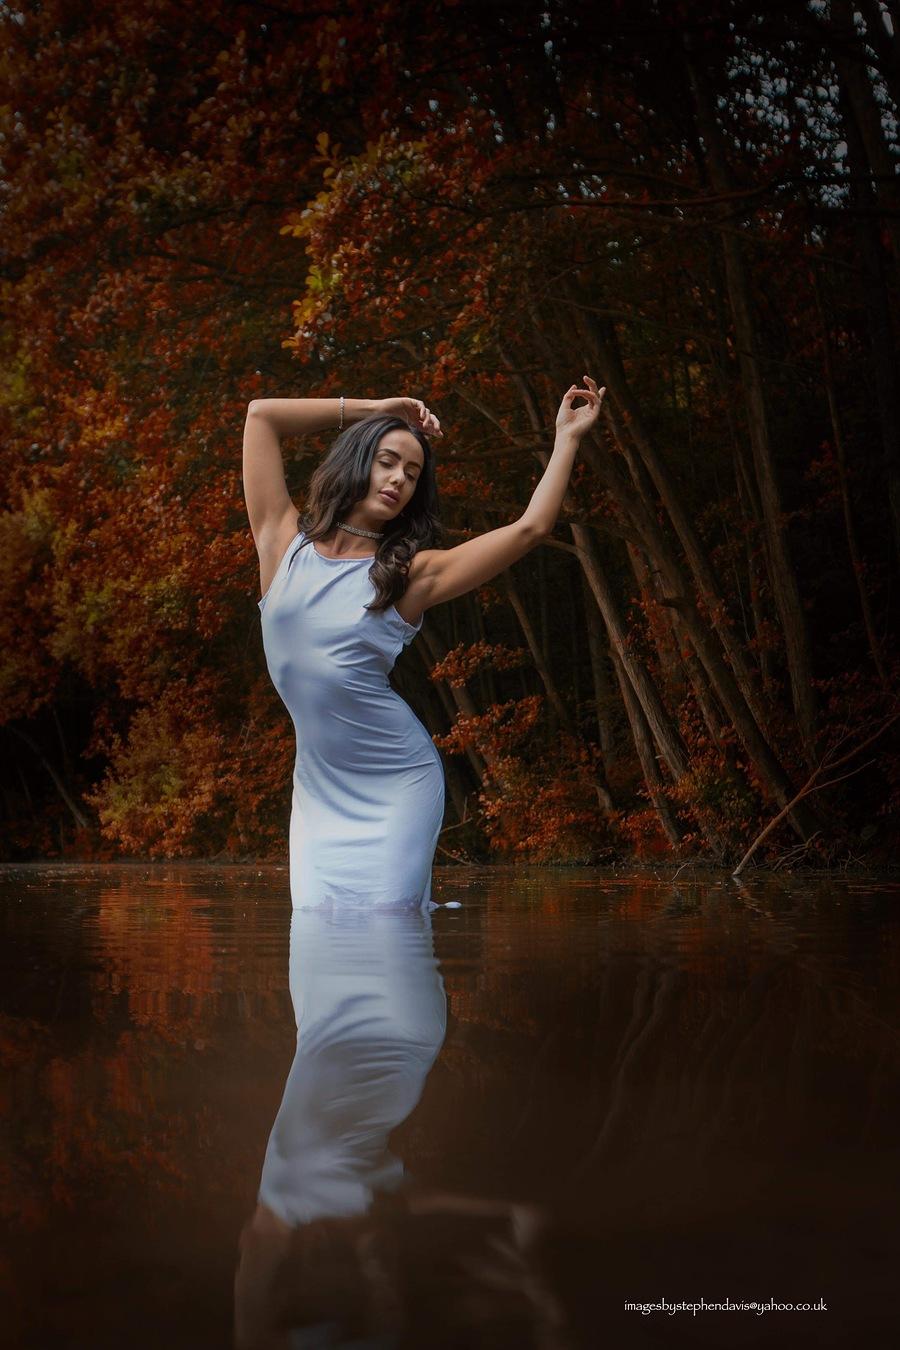 Sway / Photography by Imagesbystephendavis, Model Charlie Ellen / Uploaded 2nd November 2018 @ 01:17 PM